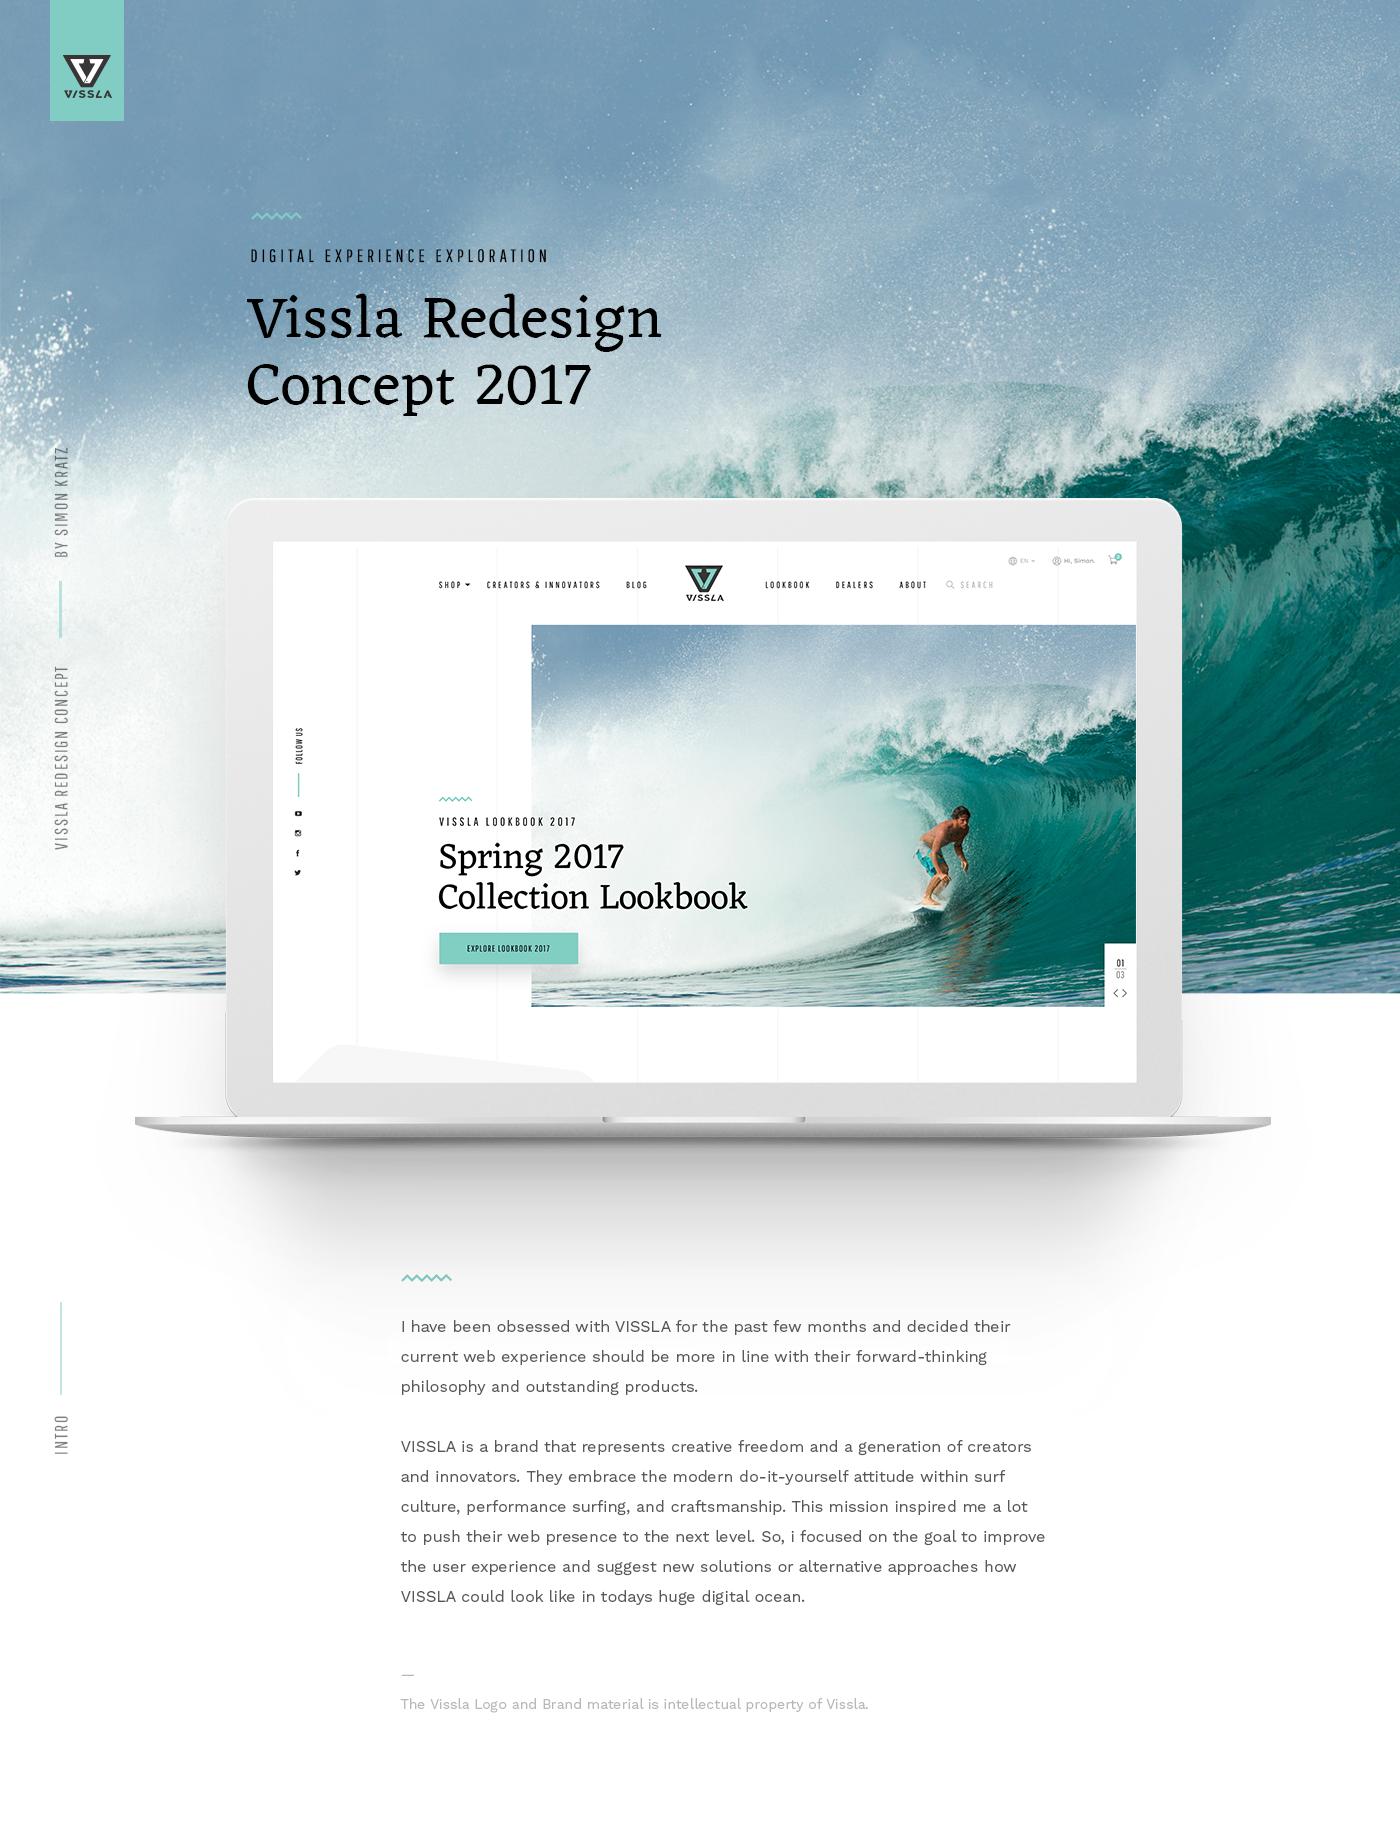 Web Design & UI/UX: Vissla Redesign Concept